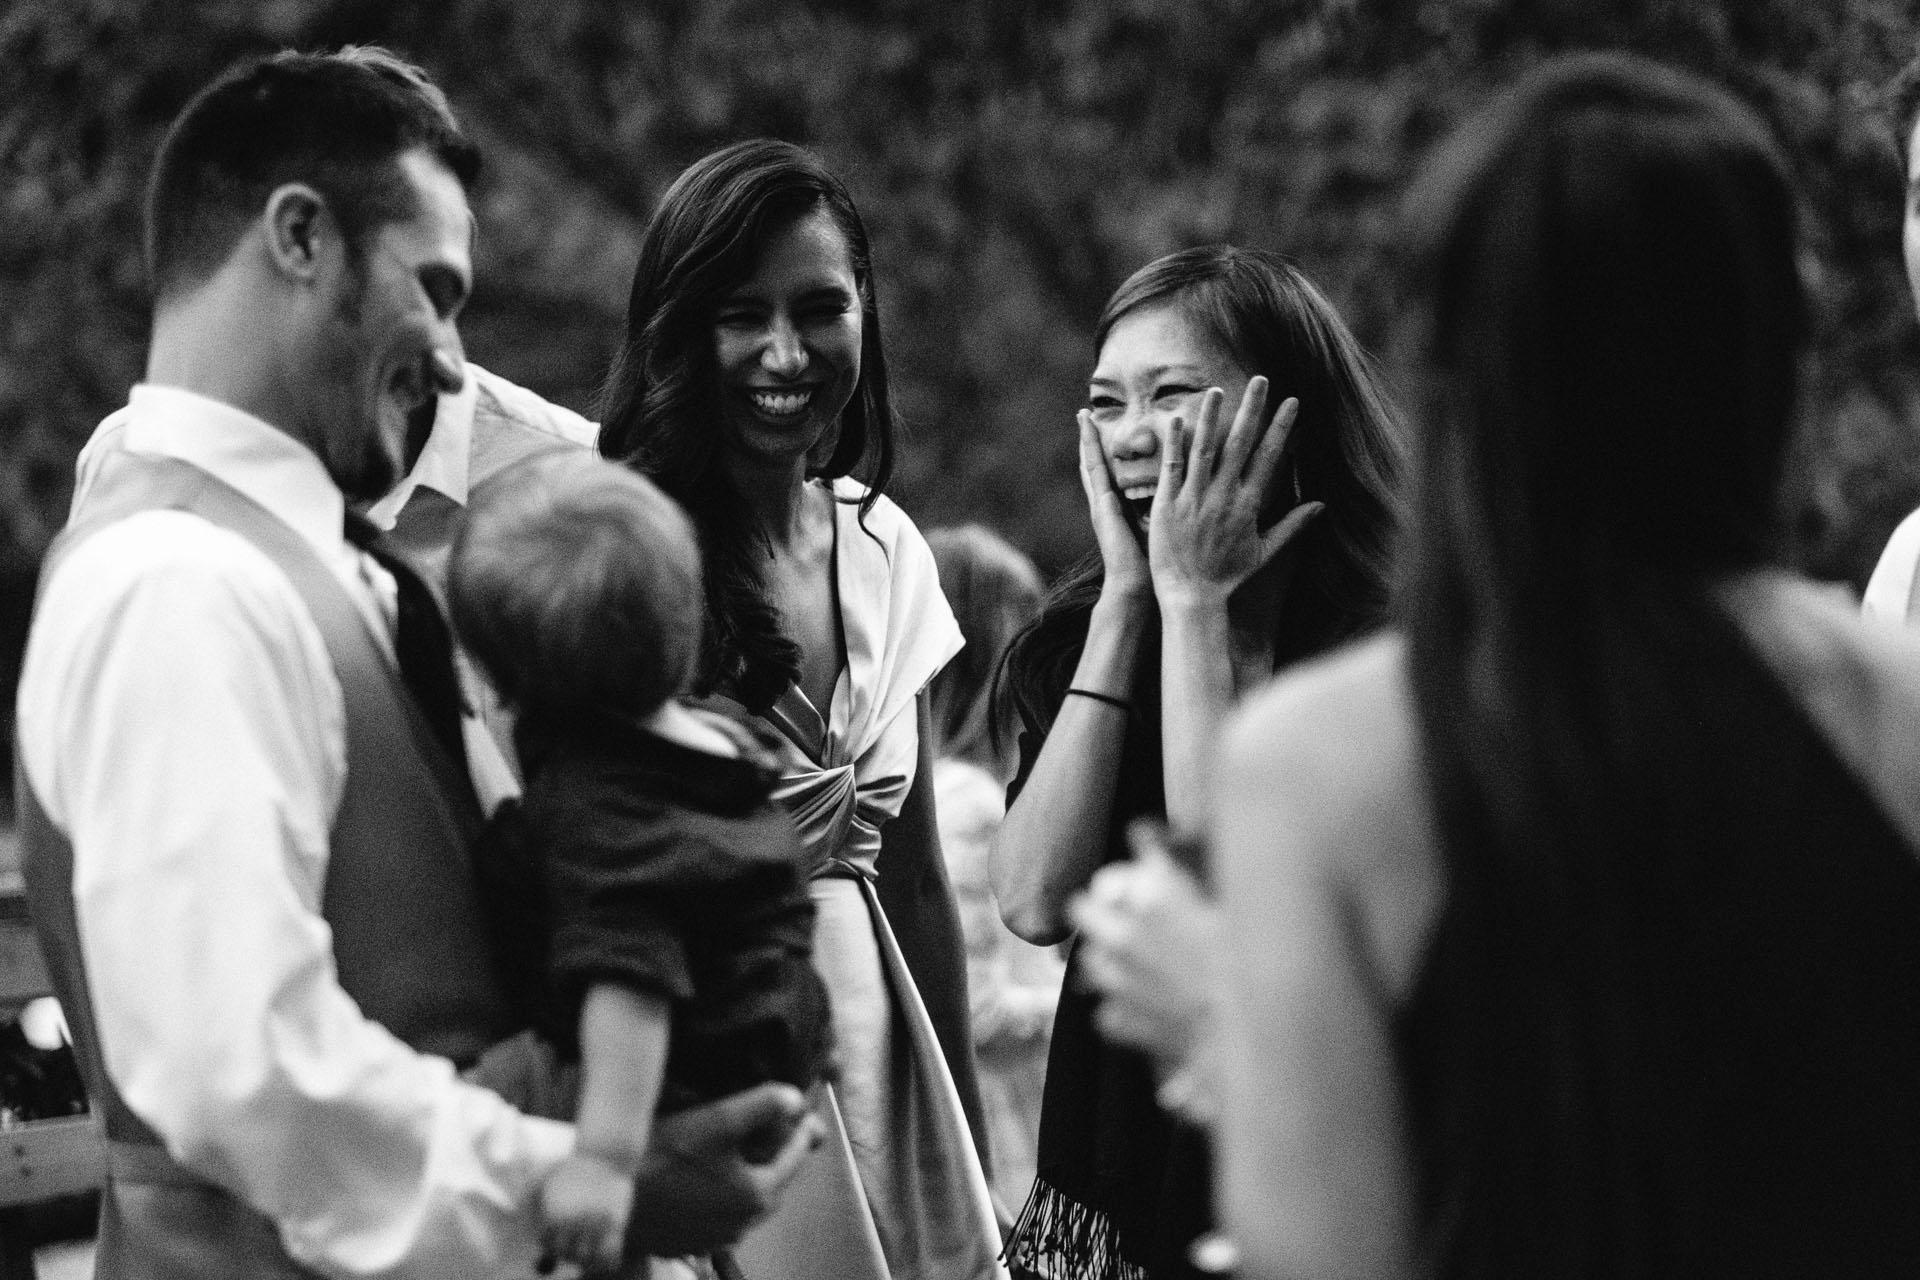 10-7-17 Devon and Jordan's Wedding-235.jpg